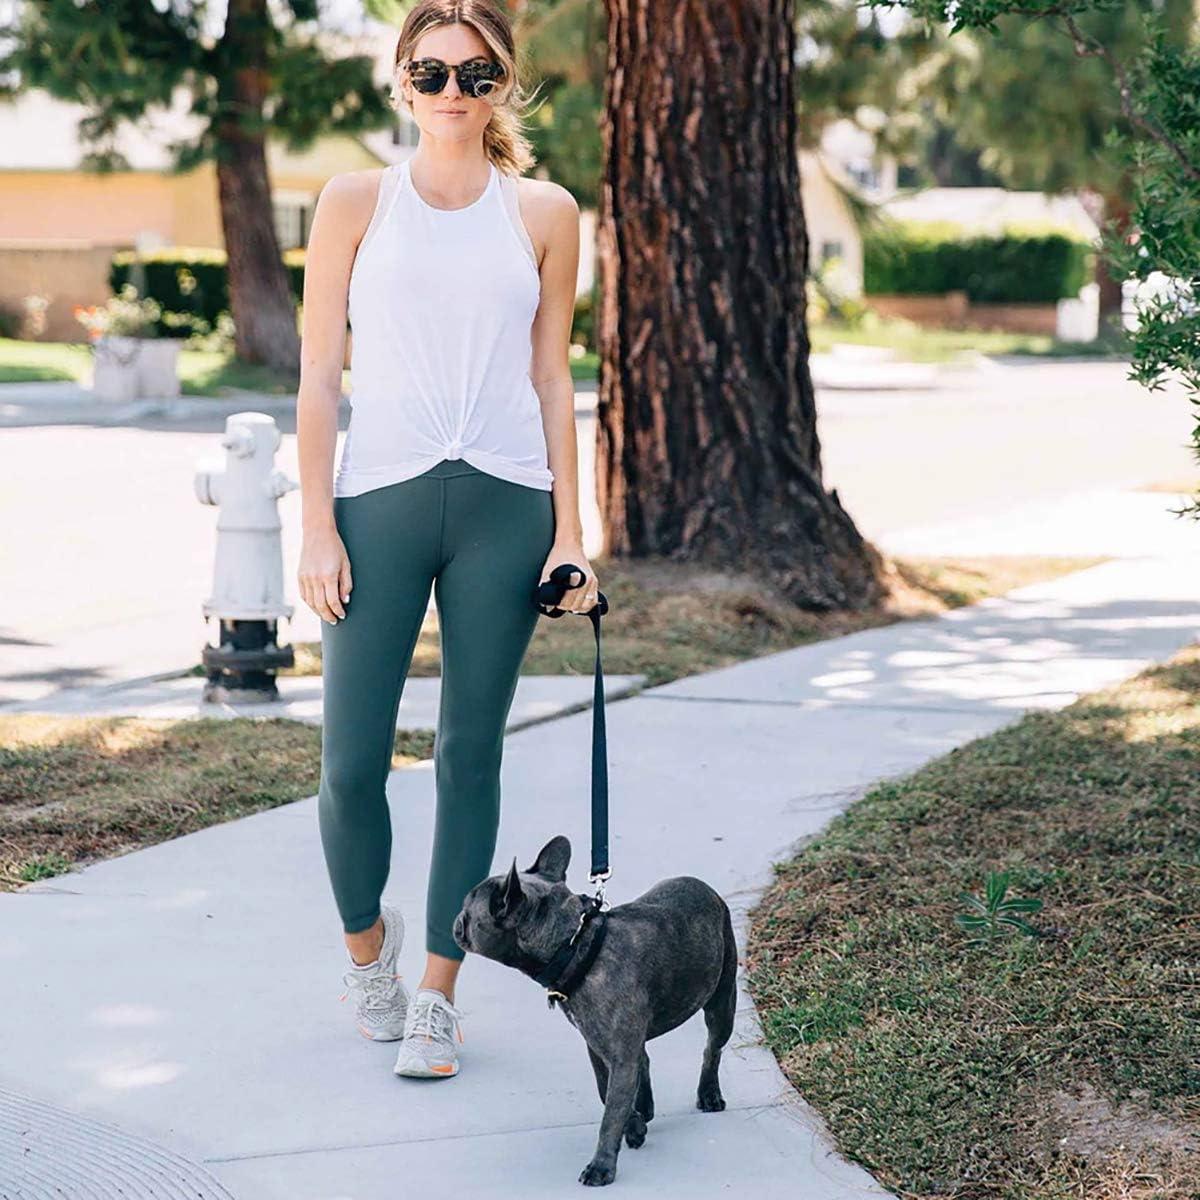 yeuG Black Leggings for Women Non See Through-High Waist Leggings Tummy Control Pants